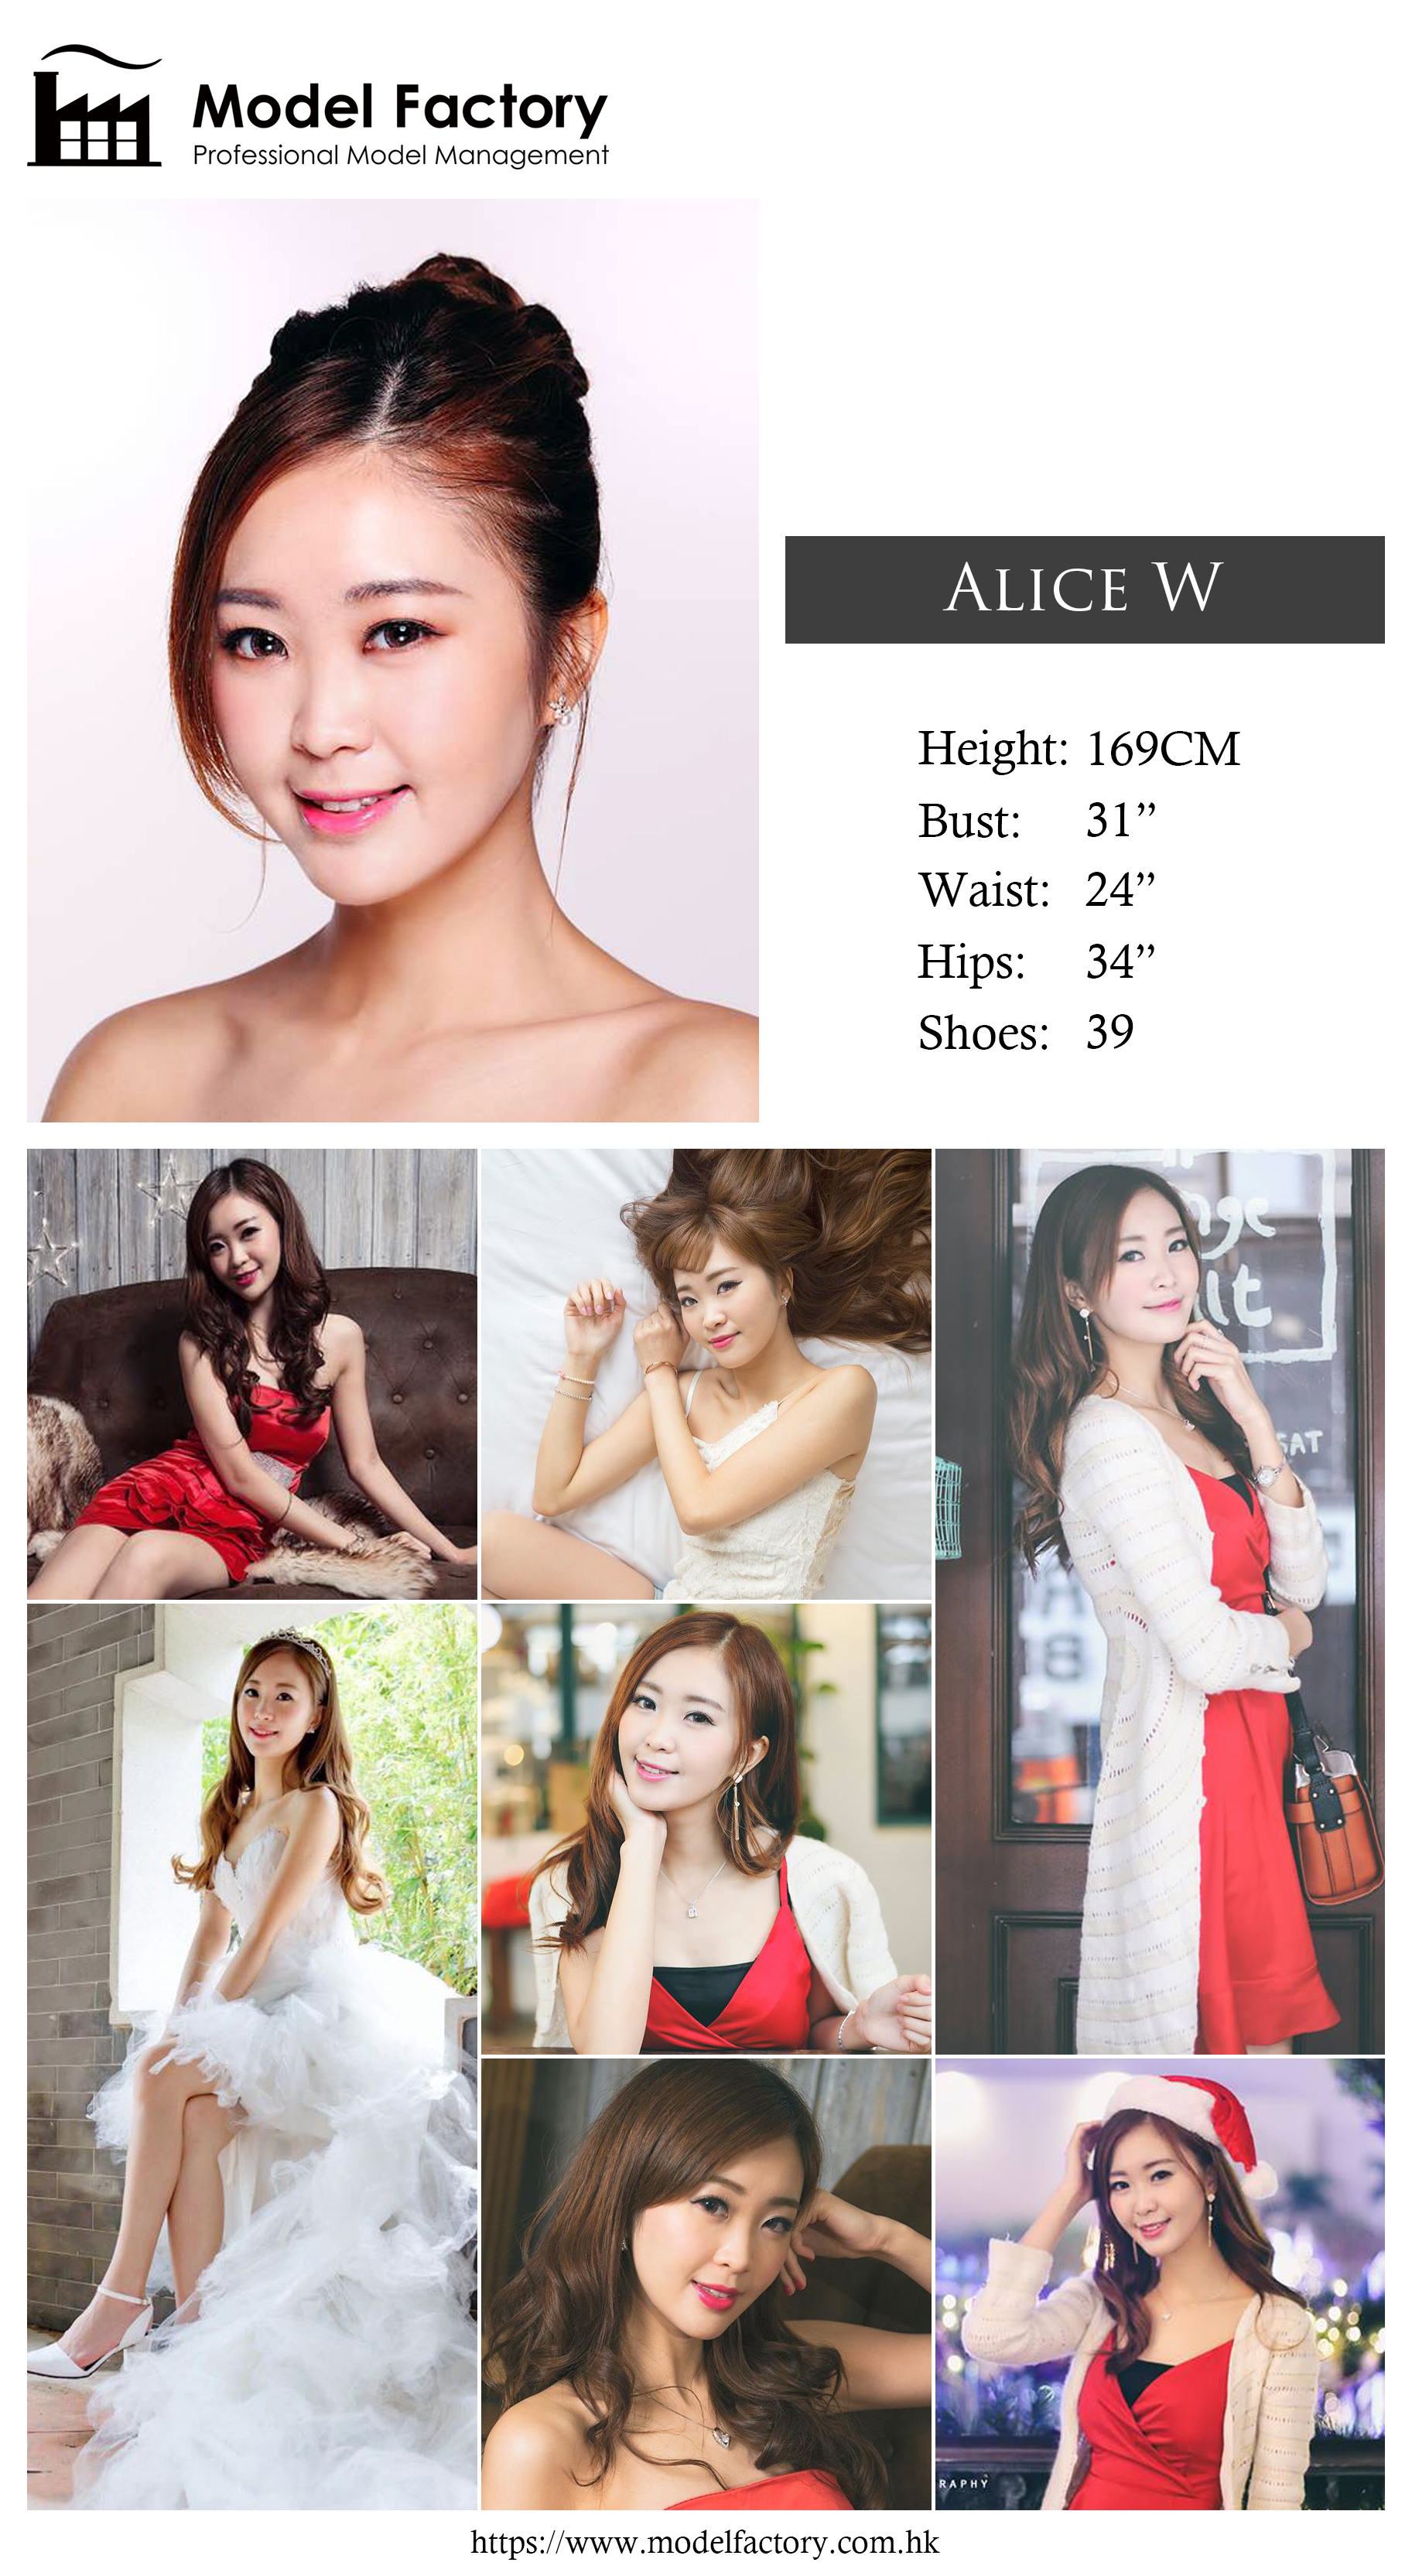 Model Factory Hong Kong Female Model AliceW